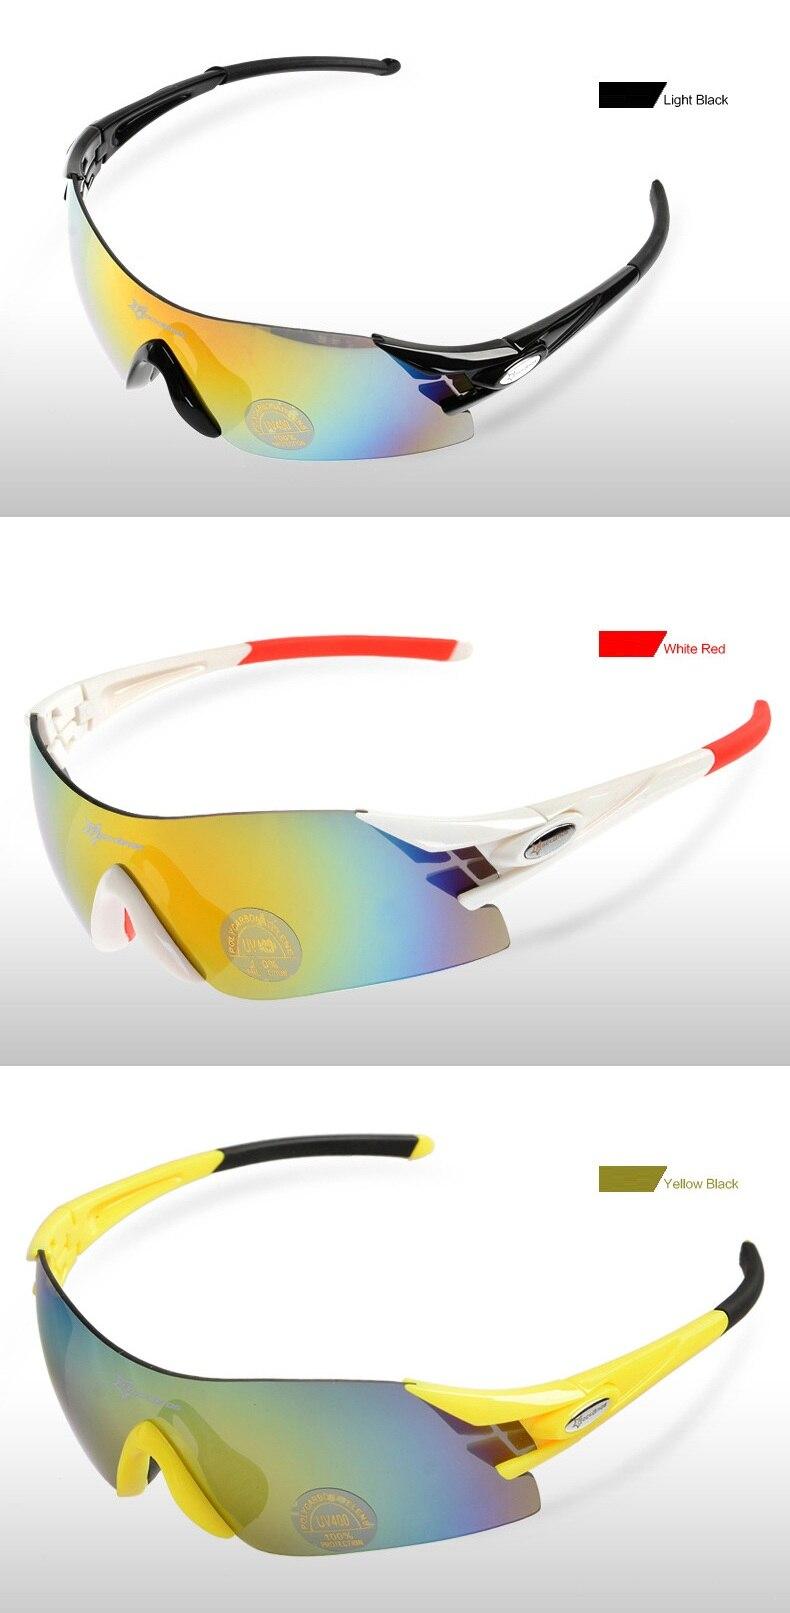 db383ed8e1 Rockbros hombres mujeres negro gafas de sol polarizadas pesca ciclismo gafas  fresco montar MTB bicicleta gafas deportivas gafasUSD 19.35/piece ...